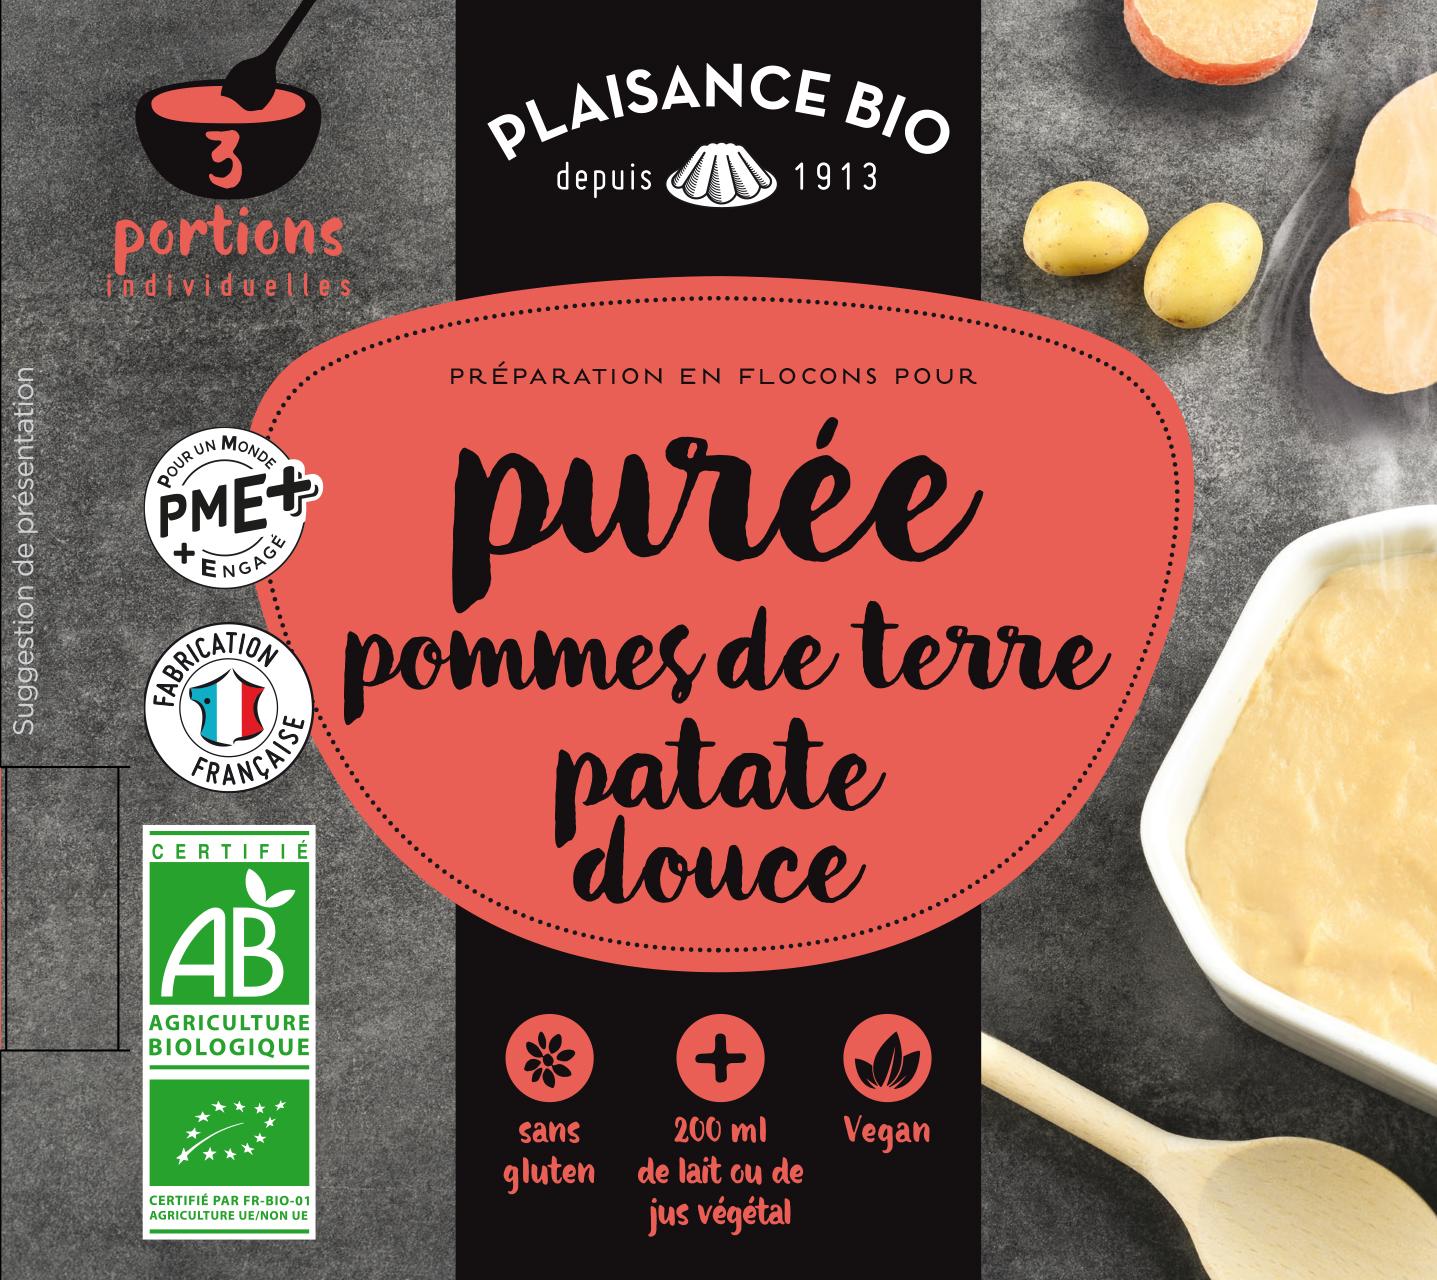 PUREE PDT PATATE DOUCE PLAISANCE BIO